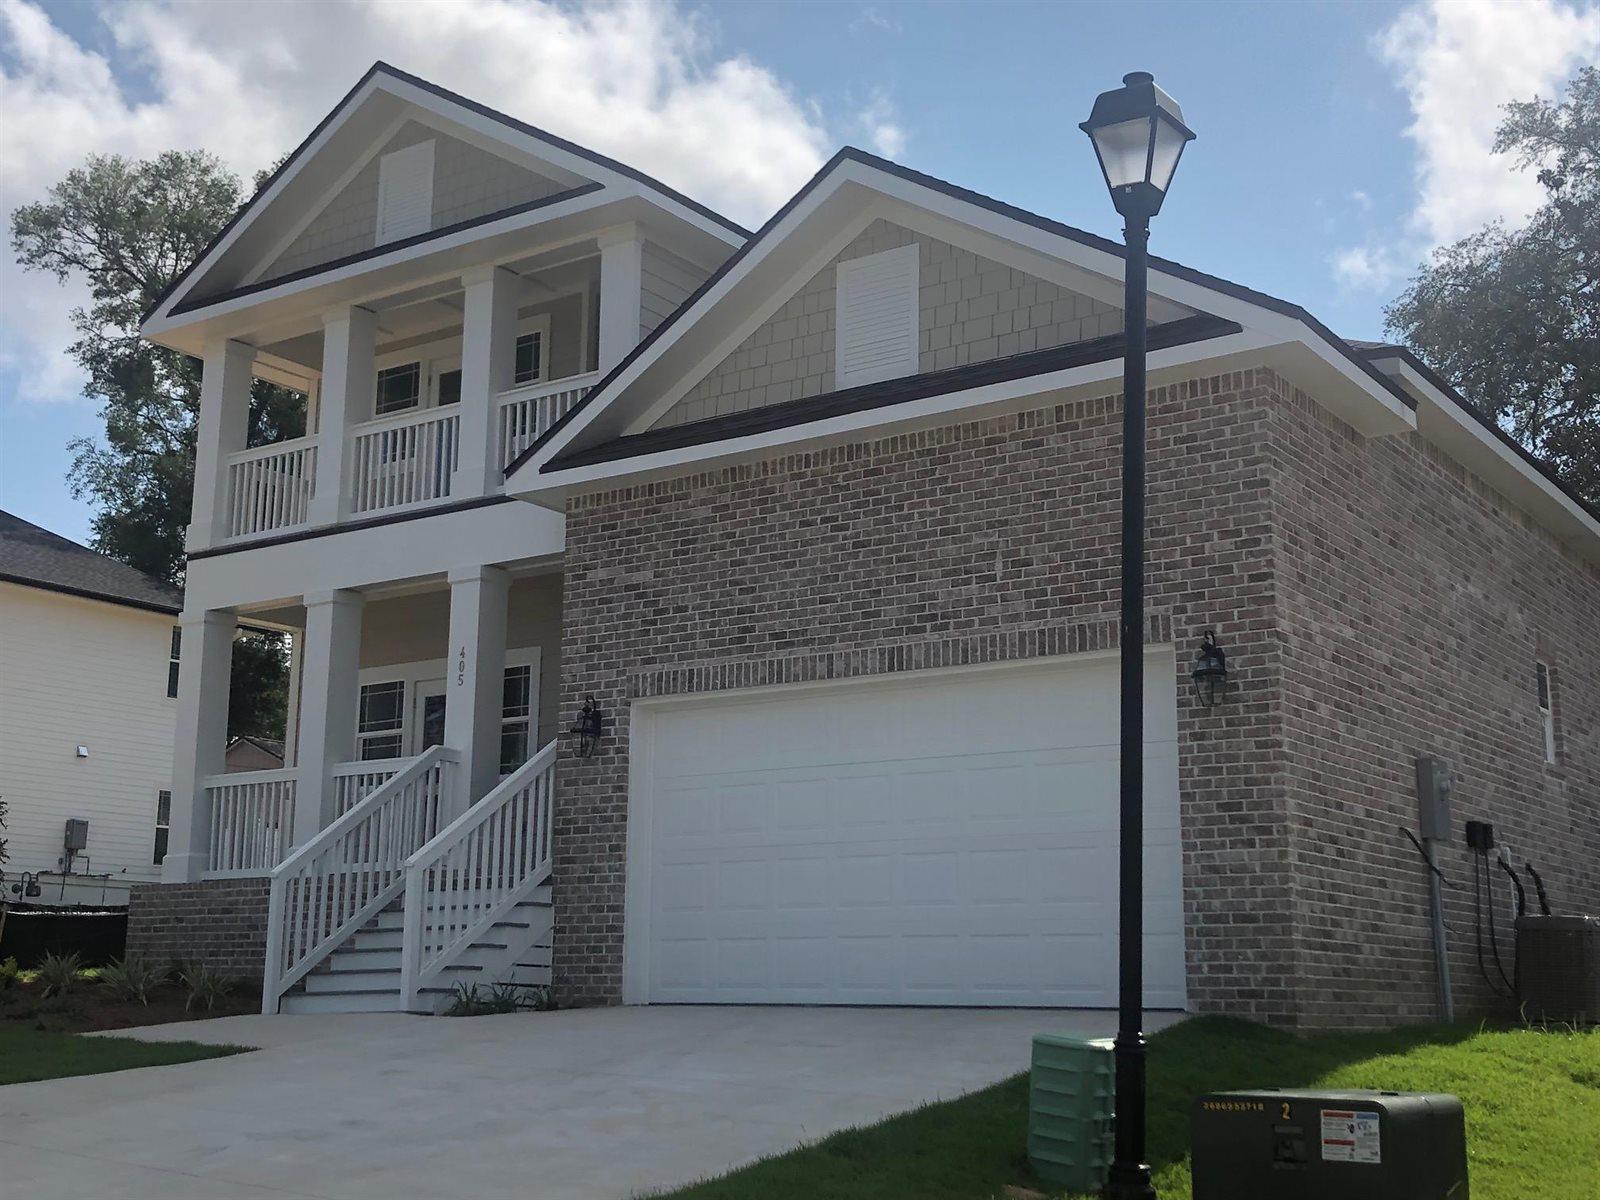 407 Hideaway Lane, Niceville, FL 32578